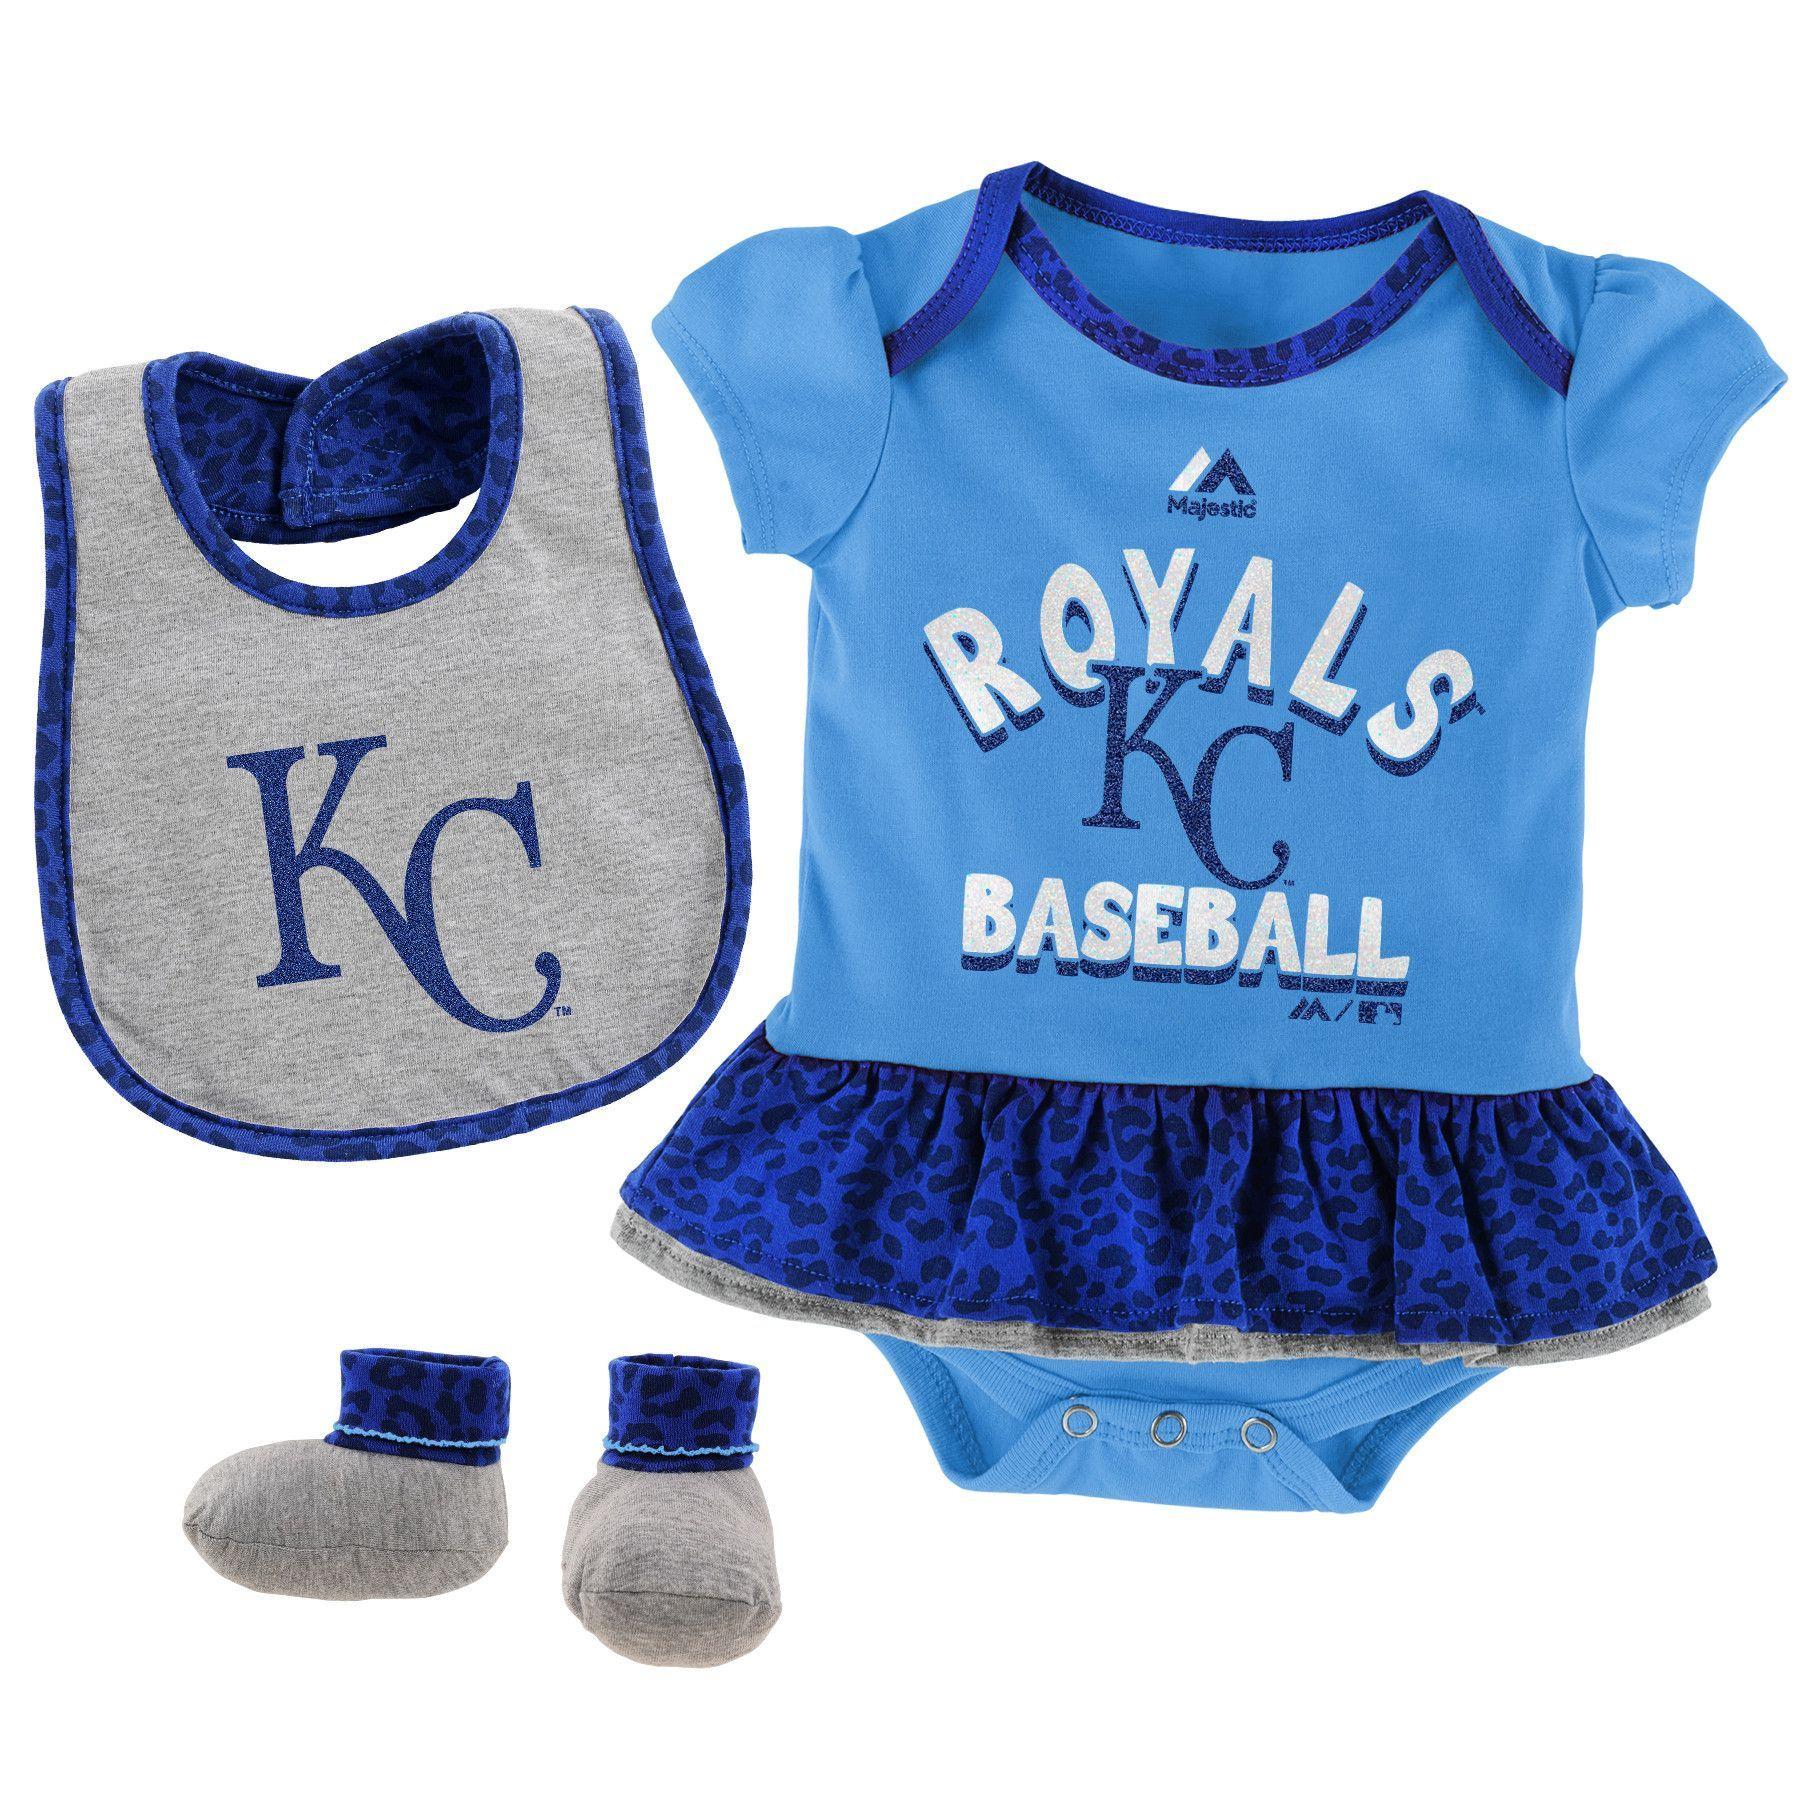 5efa6e2e Kansas City Royals Infant Wild Card Bib & Booty Set | Products ...